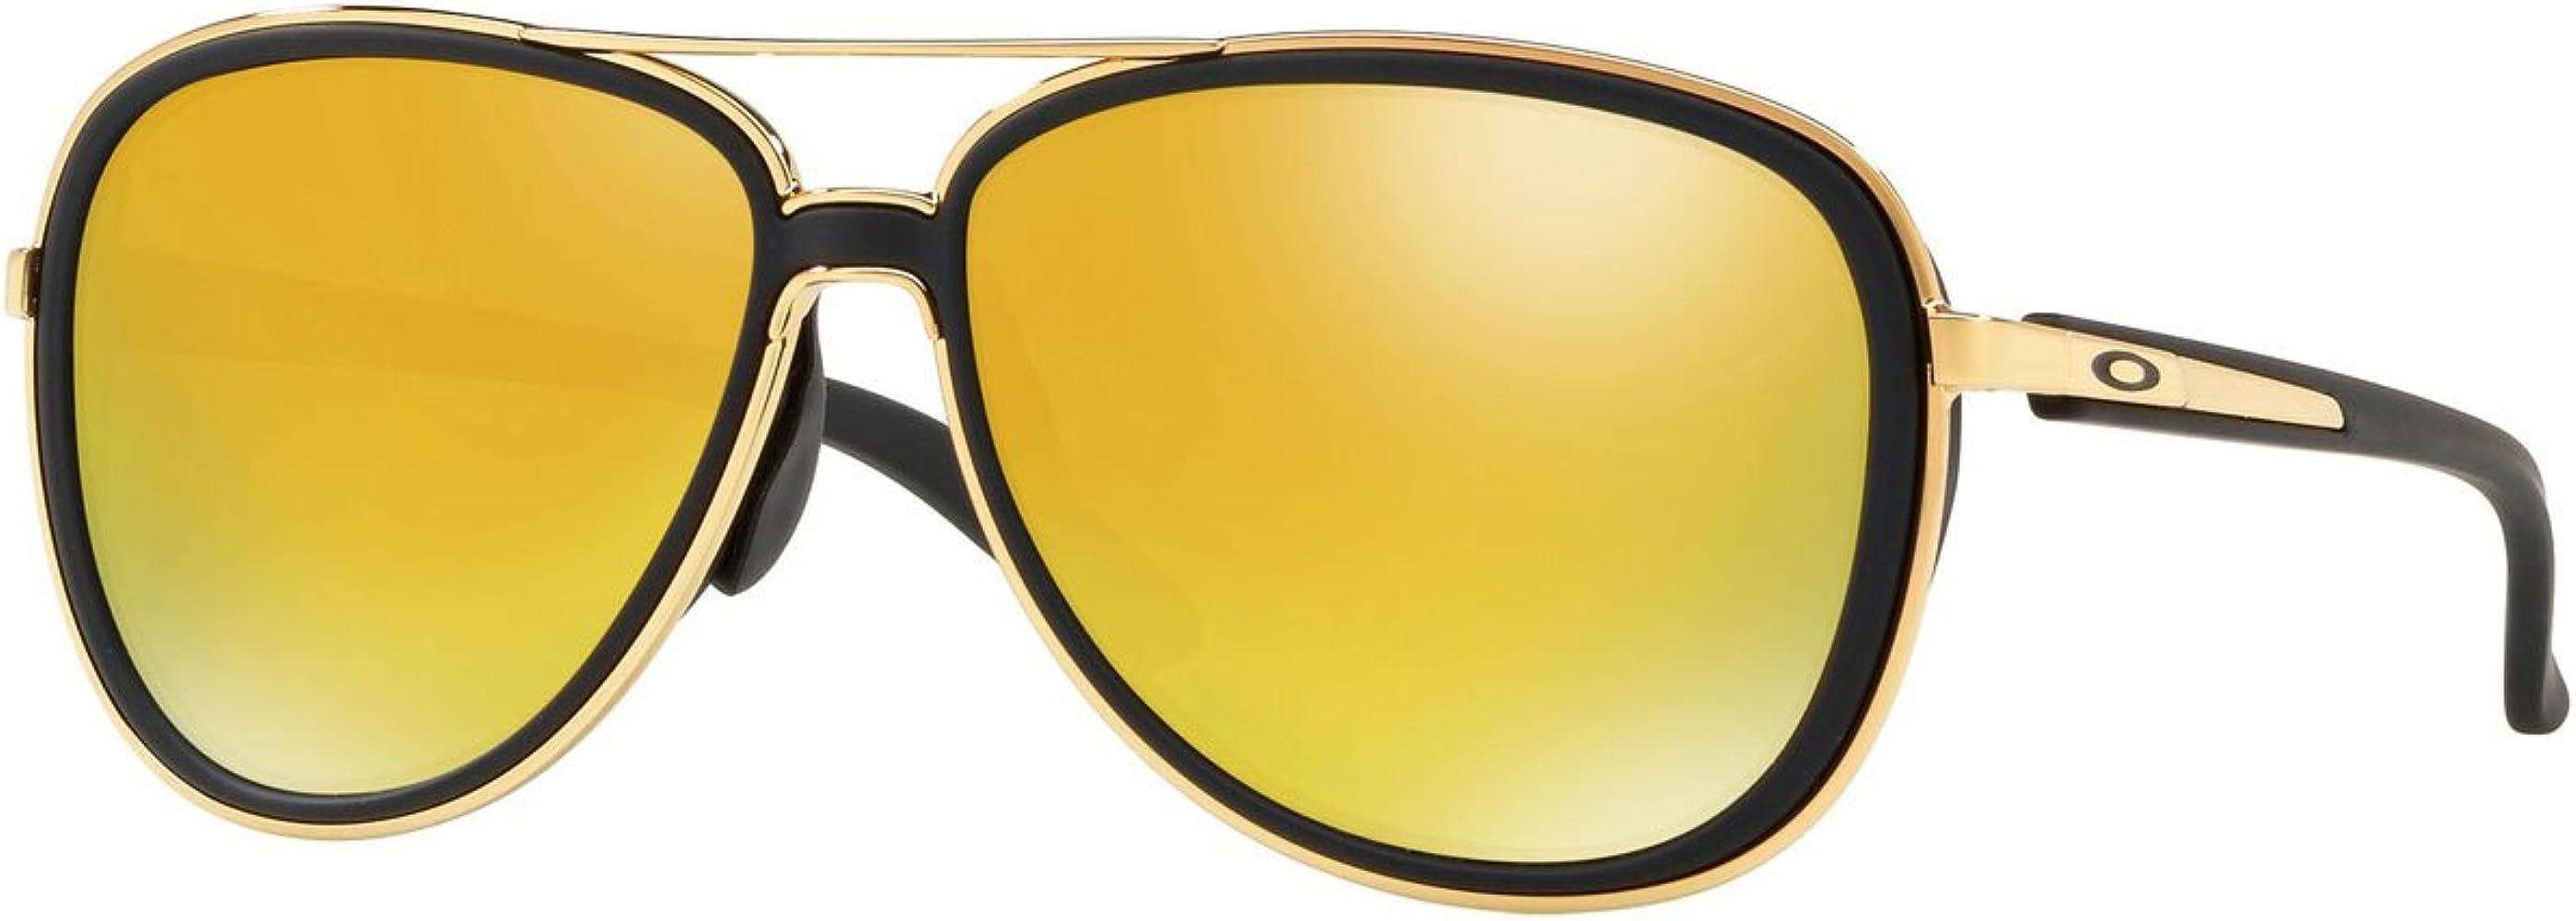 04091feda Oakley Women's Split Time Non-Polarized Iridium Aviator Sunglasses,Black,  ...